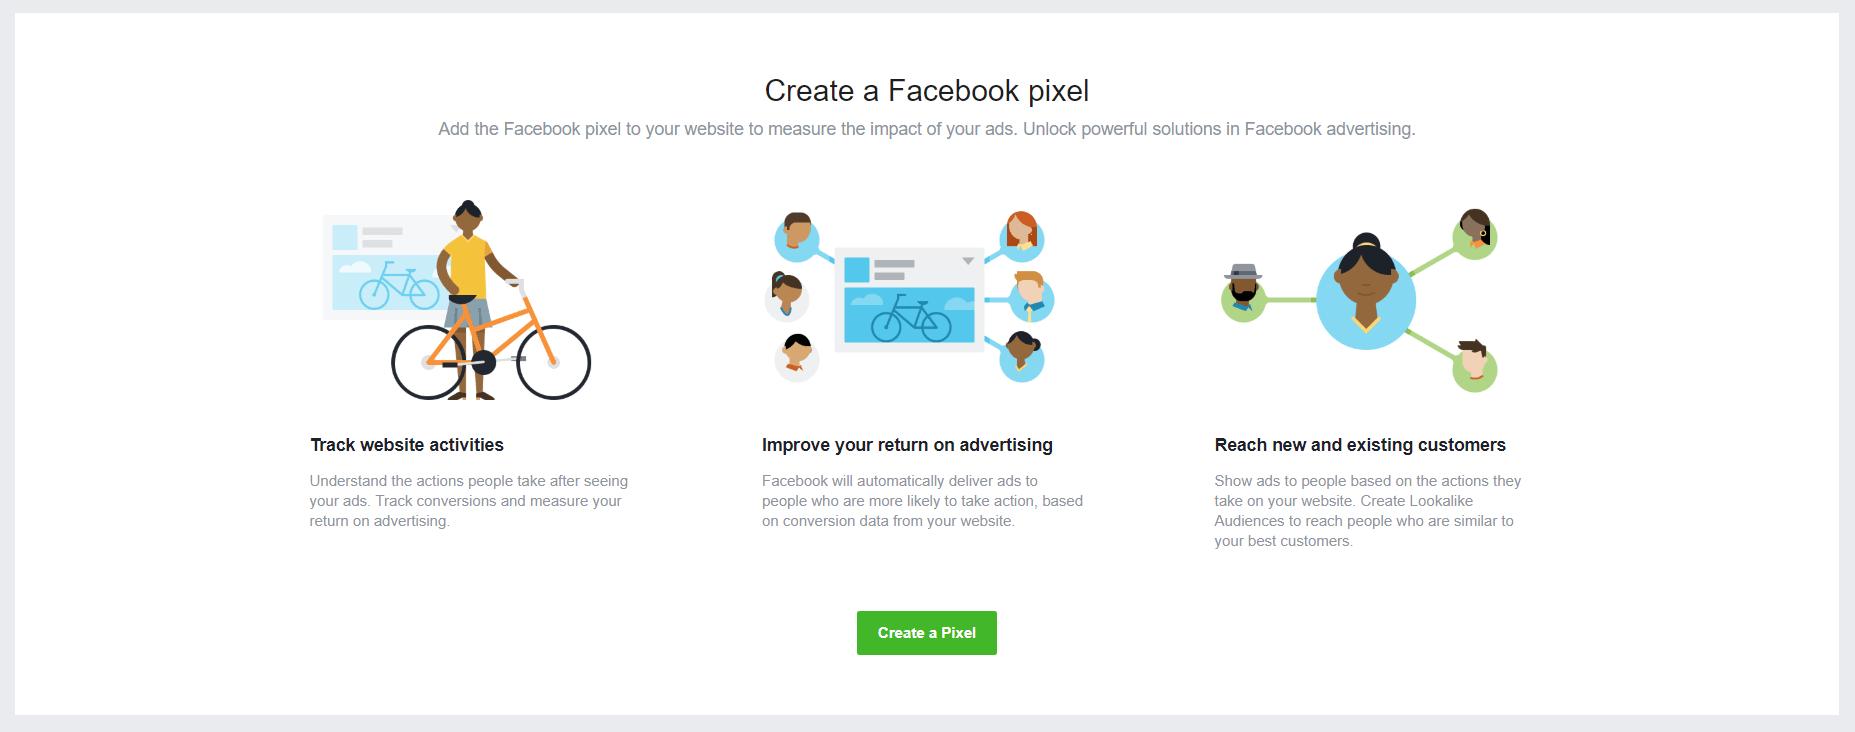 bizstyler-blog-facebook-pixel-step-01-create